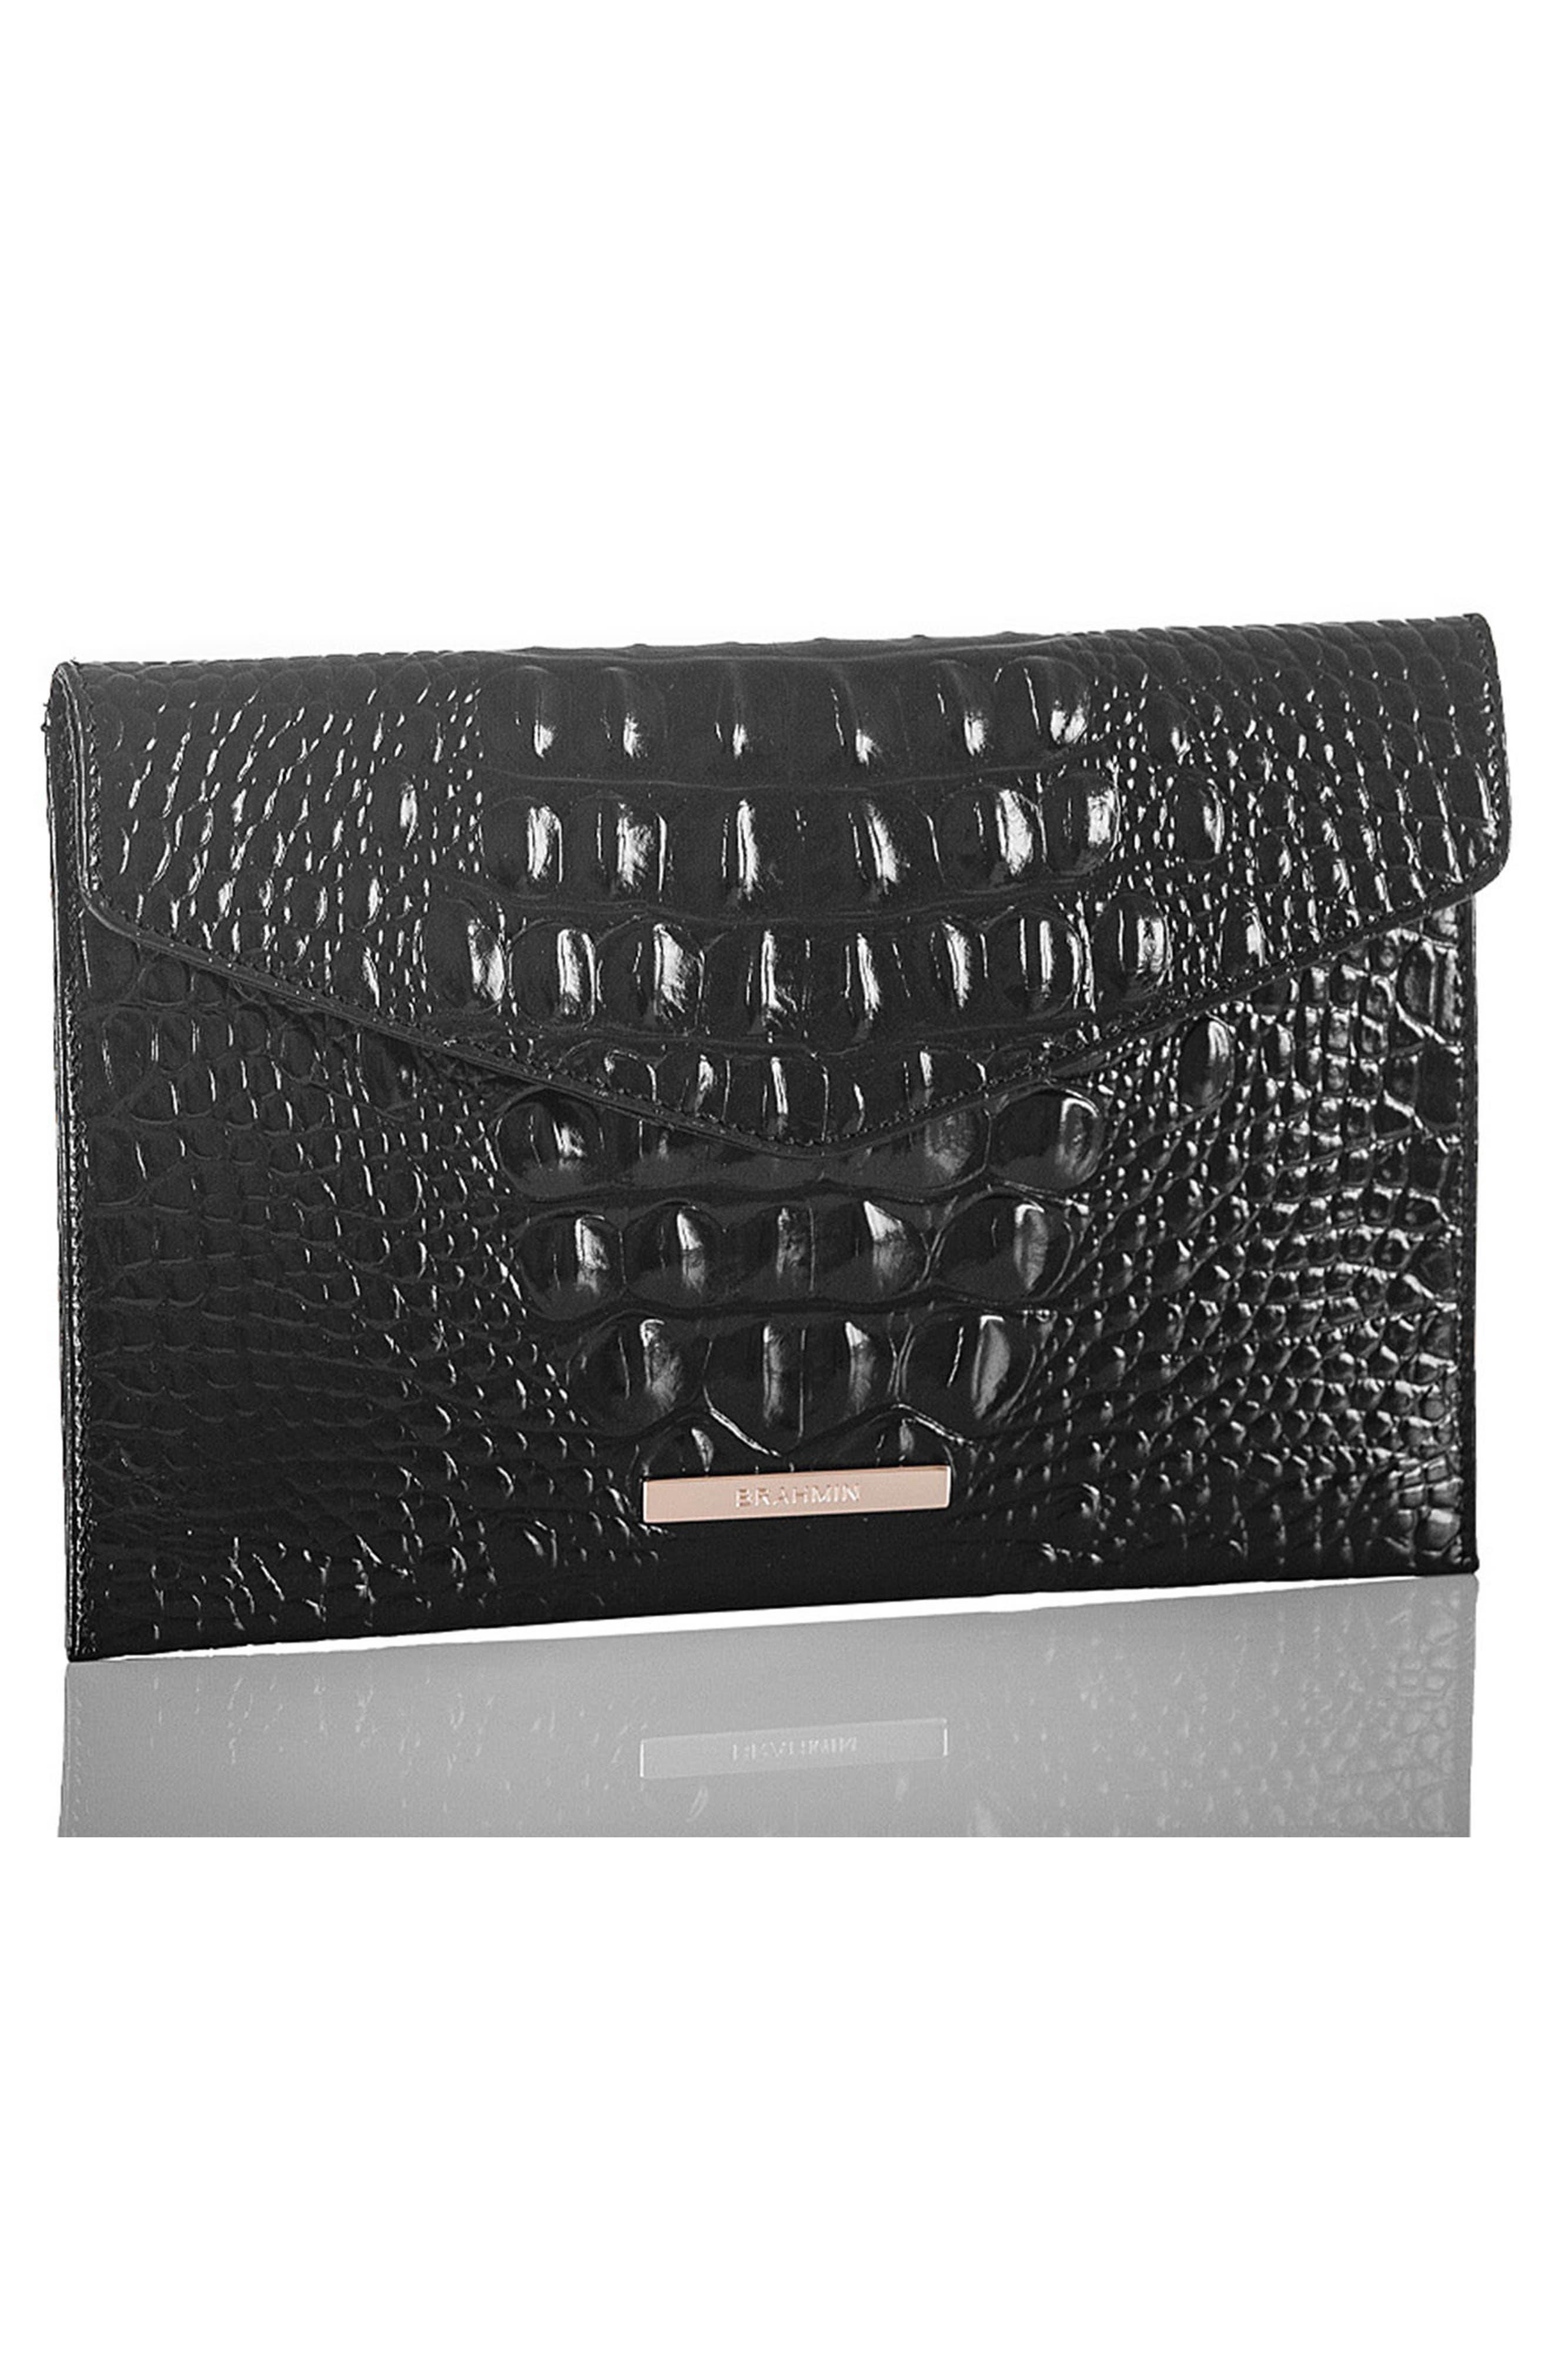 Melbourne Croc Embossed Leather Envelope Clutch,                             Alternate thumbnail 7, color,                             BLACK